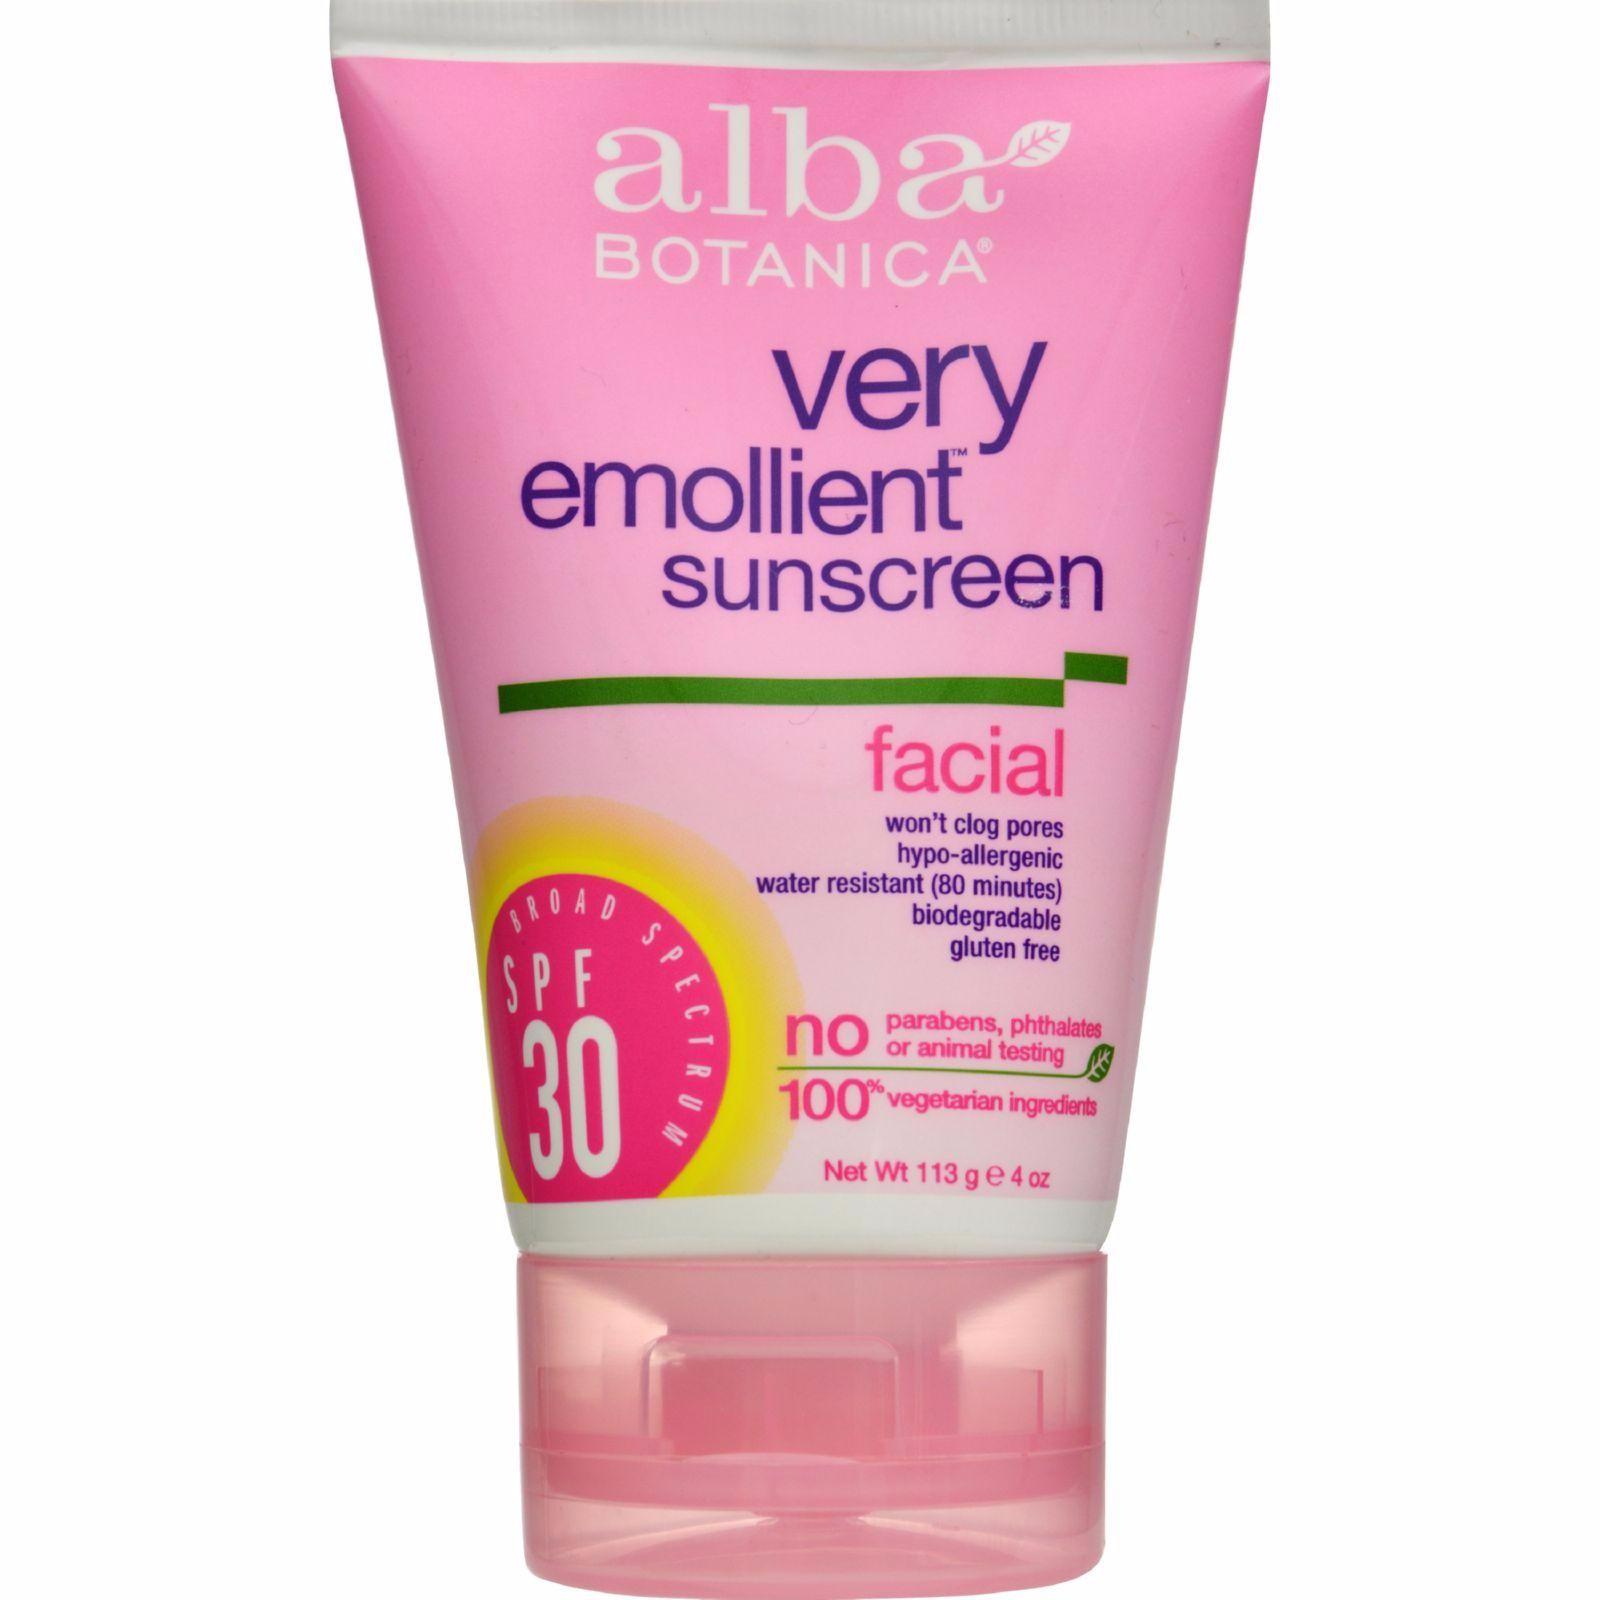 Alba Botanica Very Emollient Facial Sunscreen, Spf 30, 4 Oz, 2 Pack Rugby Acne Medication 5, Benzoyl Peroxide 5%, 1 Oz Each